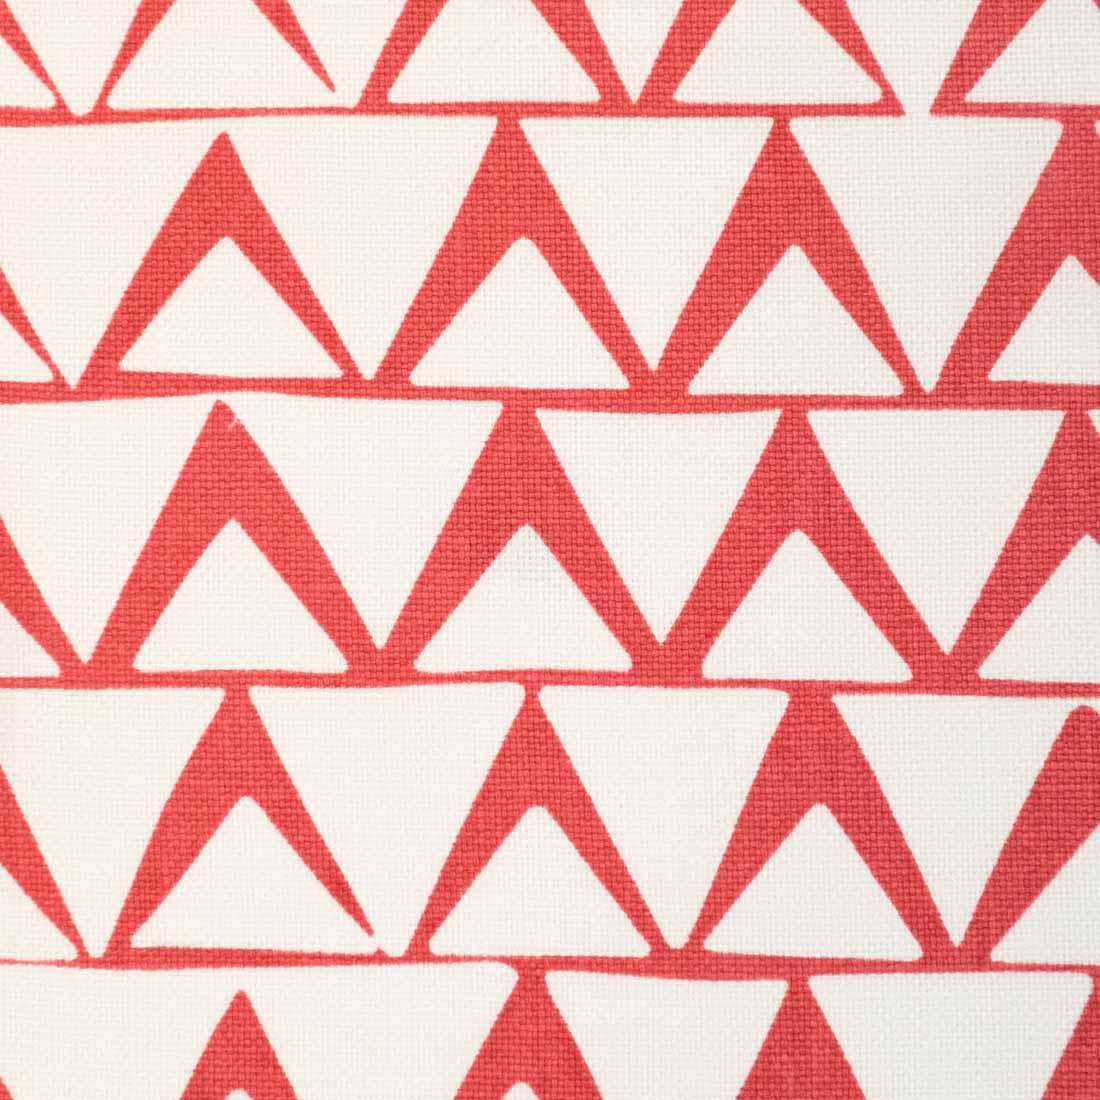 Triangles Inverse in Coral